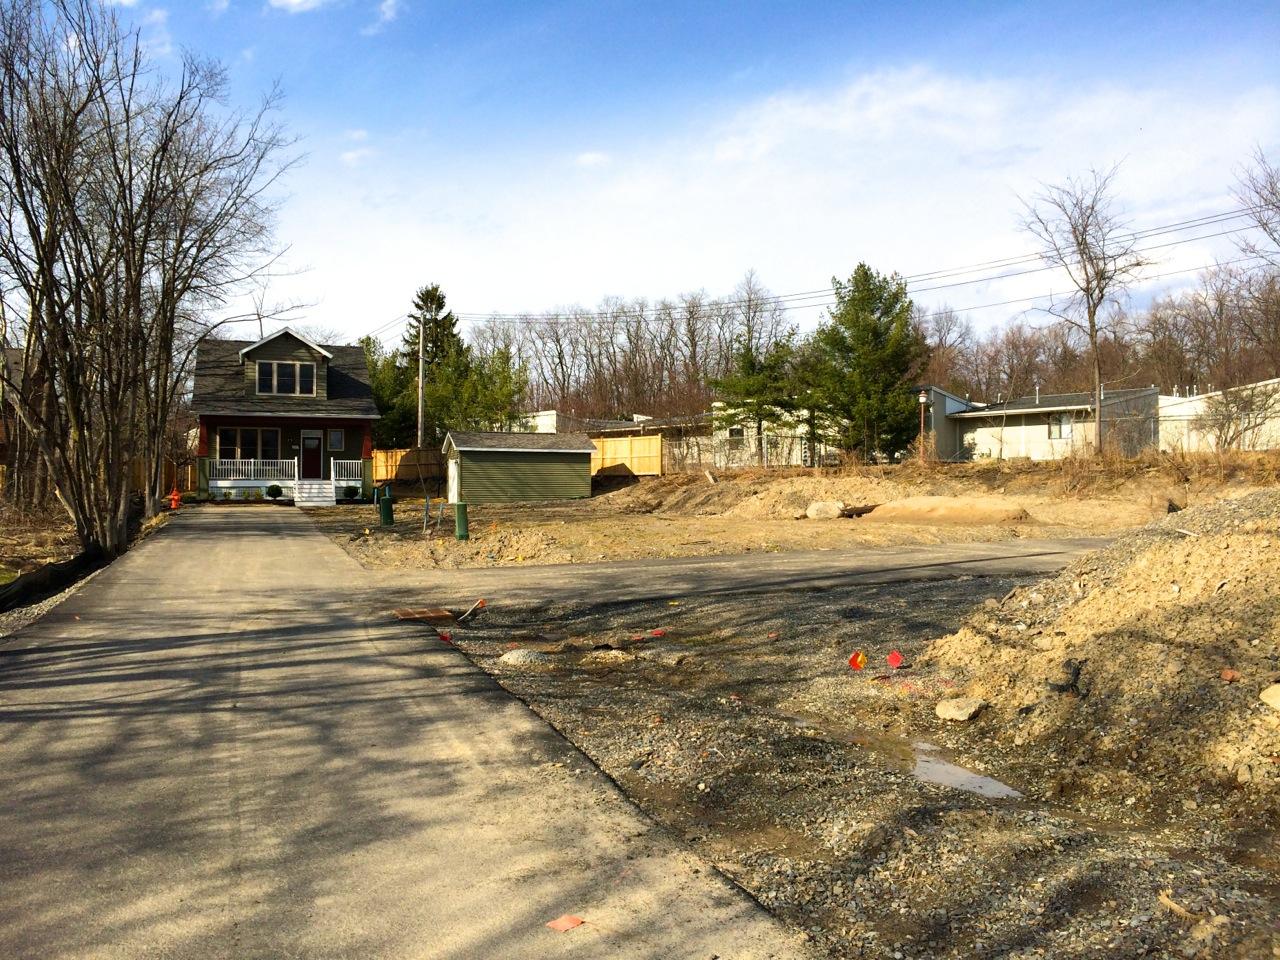 Belle_Sherman_Cottages_Ithaca_April-20141